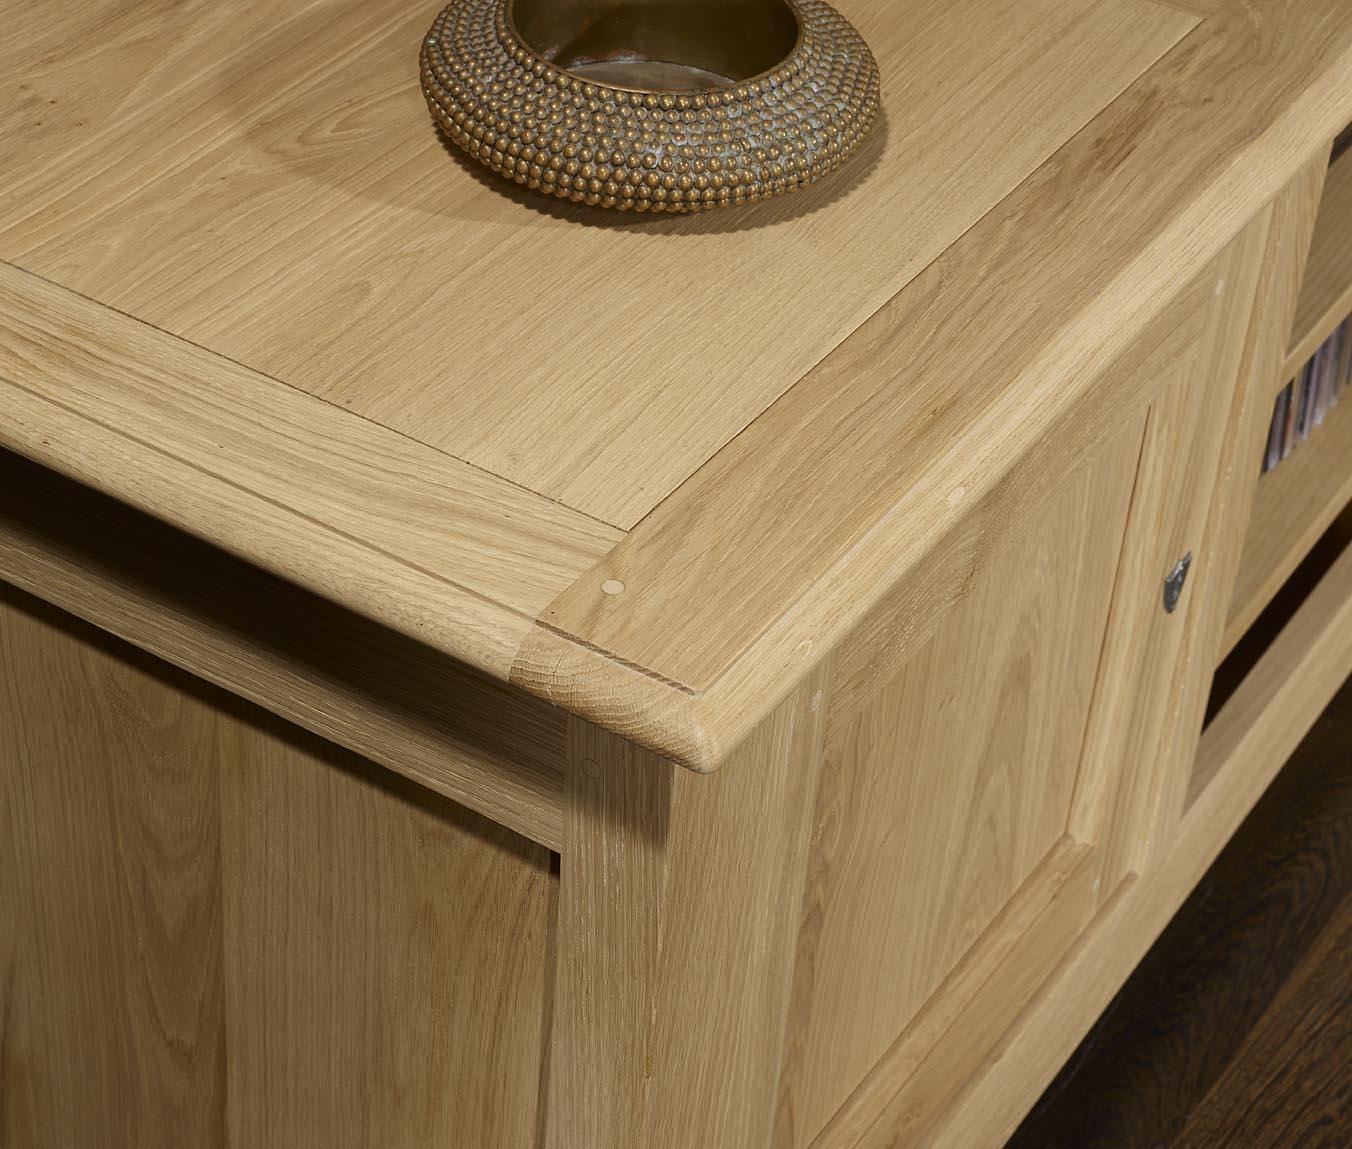 meuble tv 16 9eme en ch ne massif de style campagnard meuble en ch ne. Black Bedroom Furniture Sets. Home Design Ideas